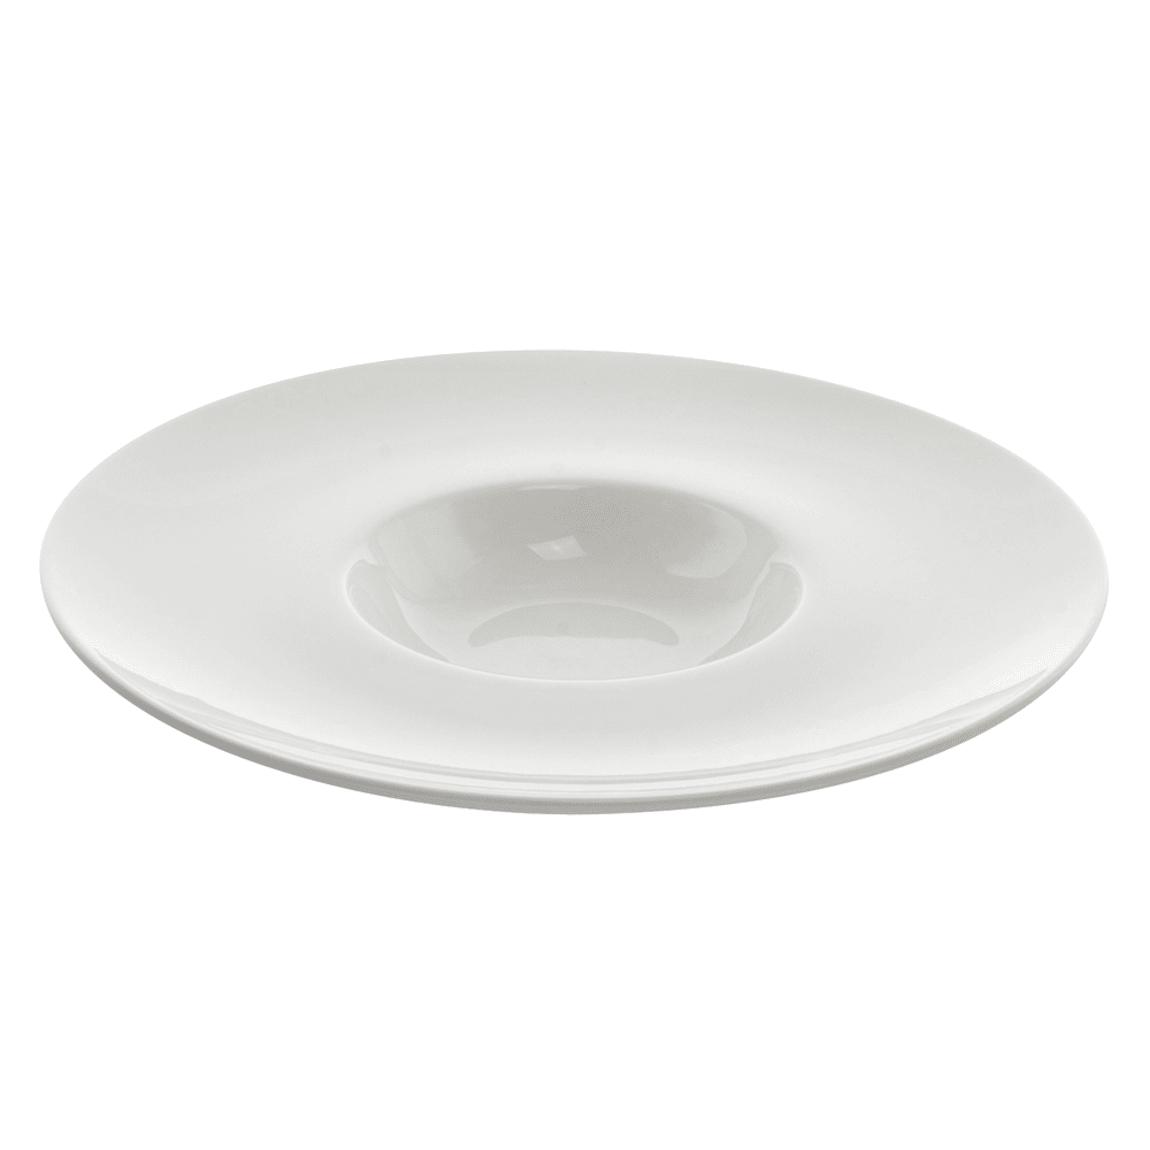 10 Strawberry Street WTR-11WIDERBWL 6 oz Round Bowl - Porcelain, White